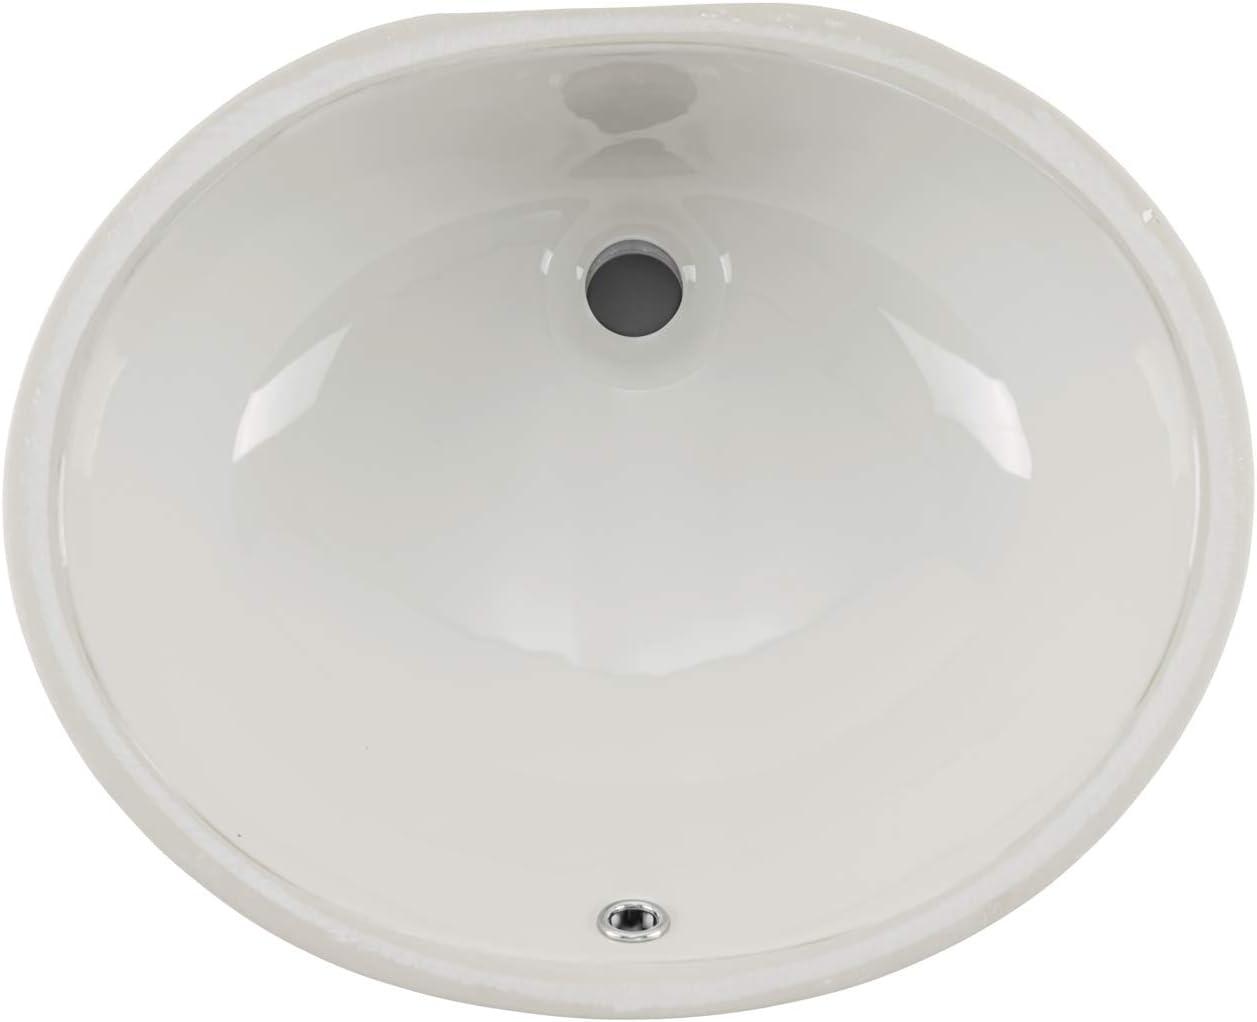 NEW ARRIVAL Soleil SS209BIS 17-in x 14-in Oval 付与 Bat Glazed Ceramic Undermount